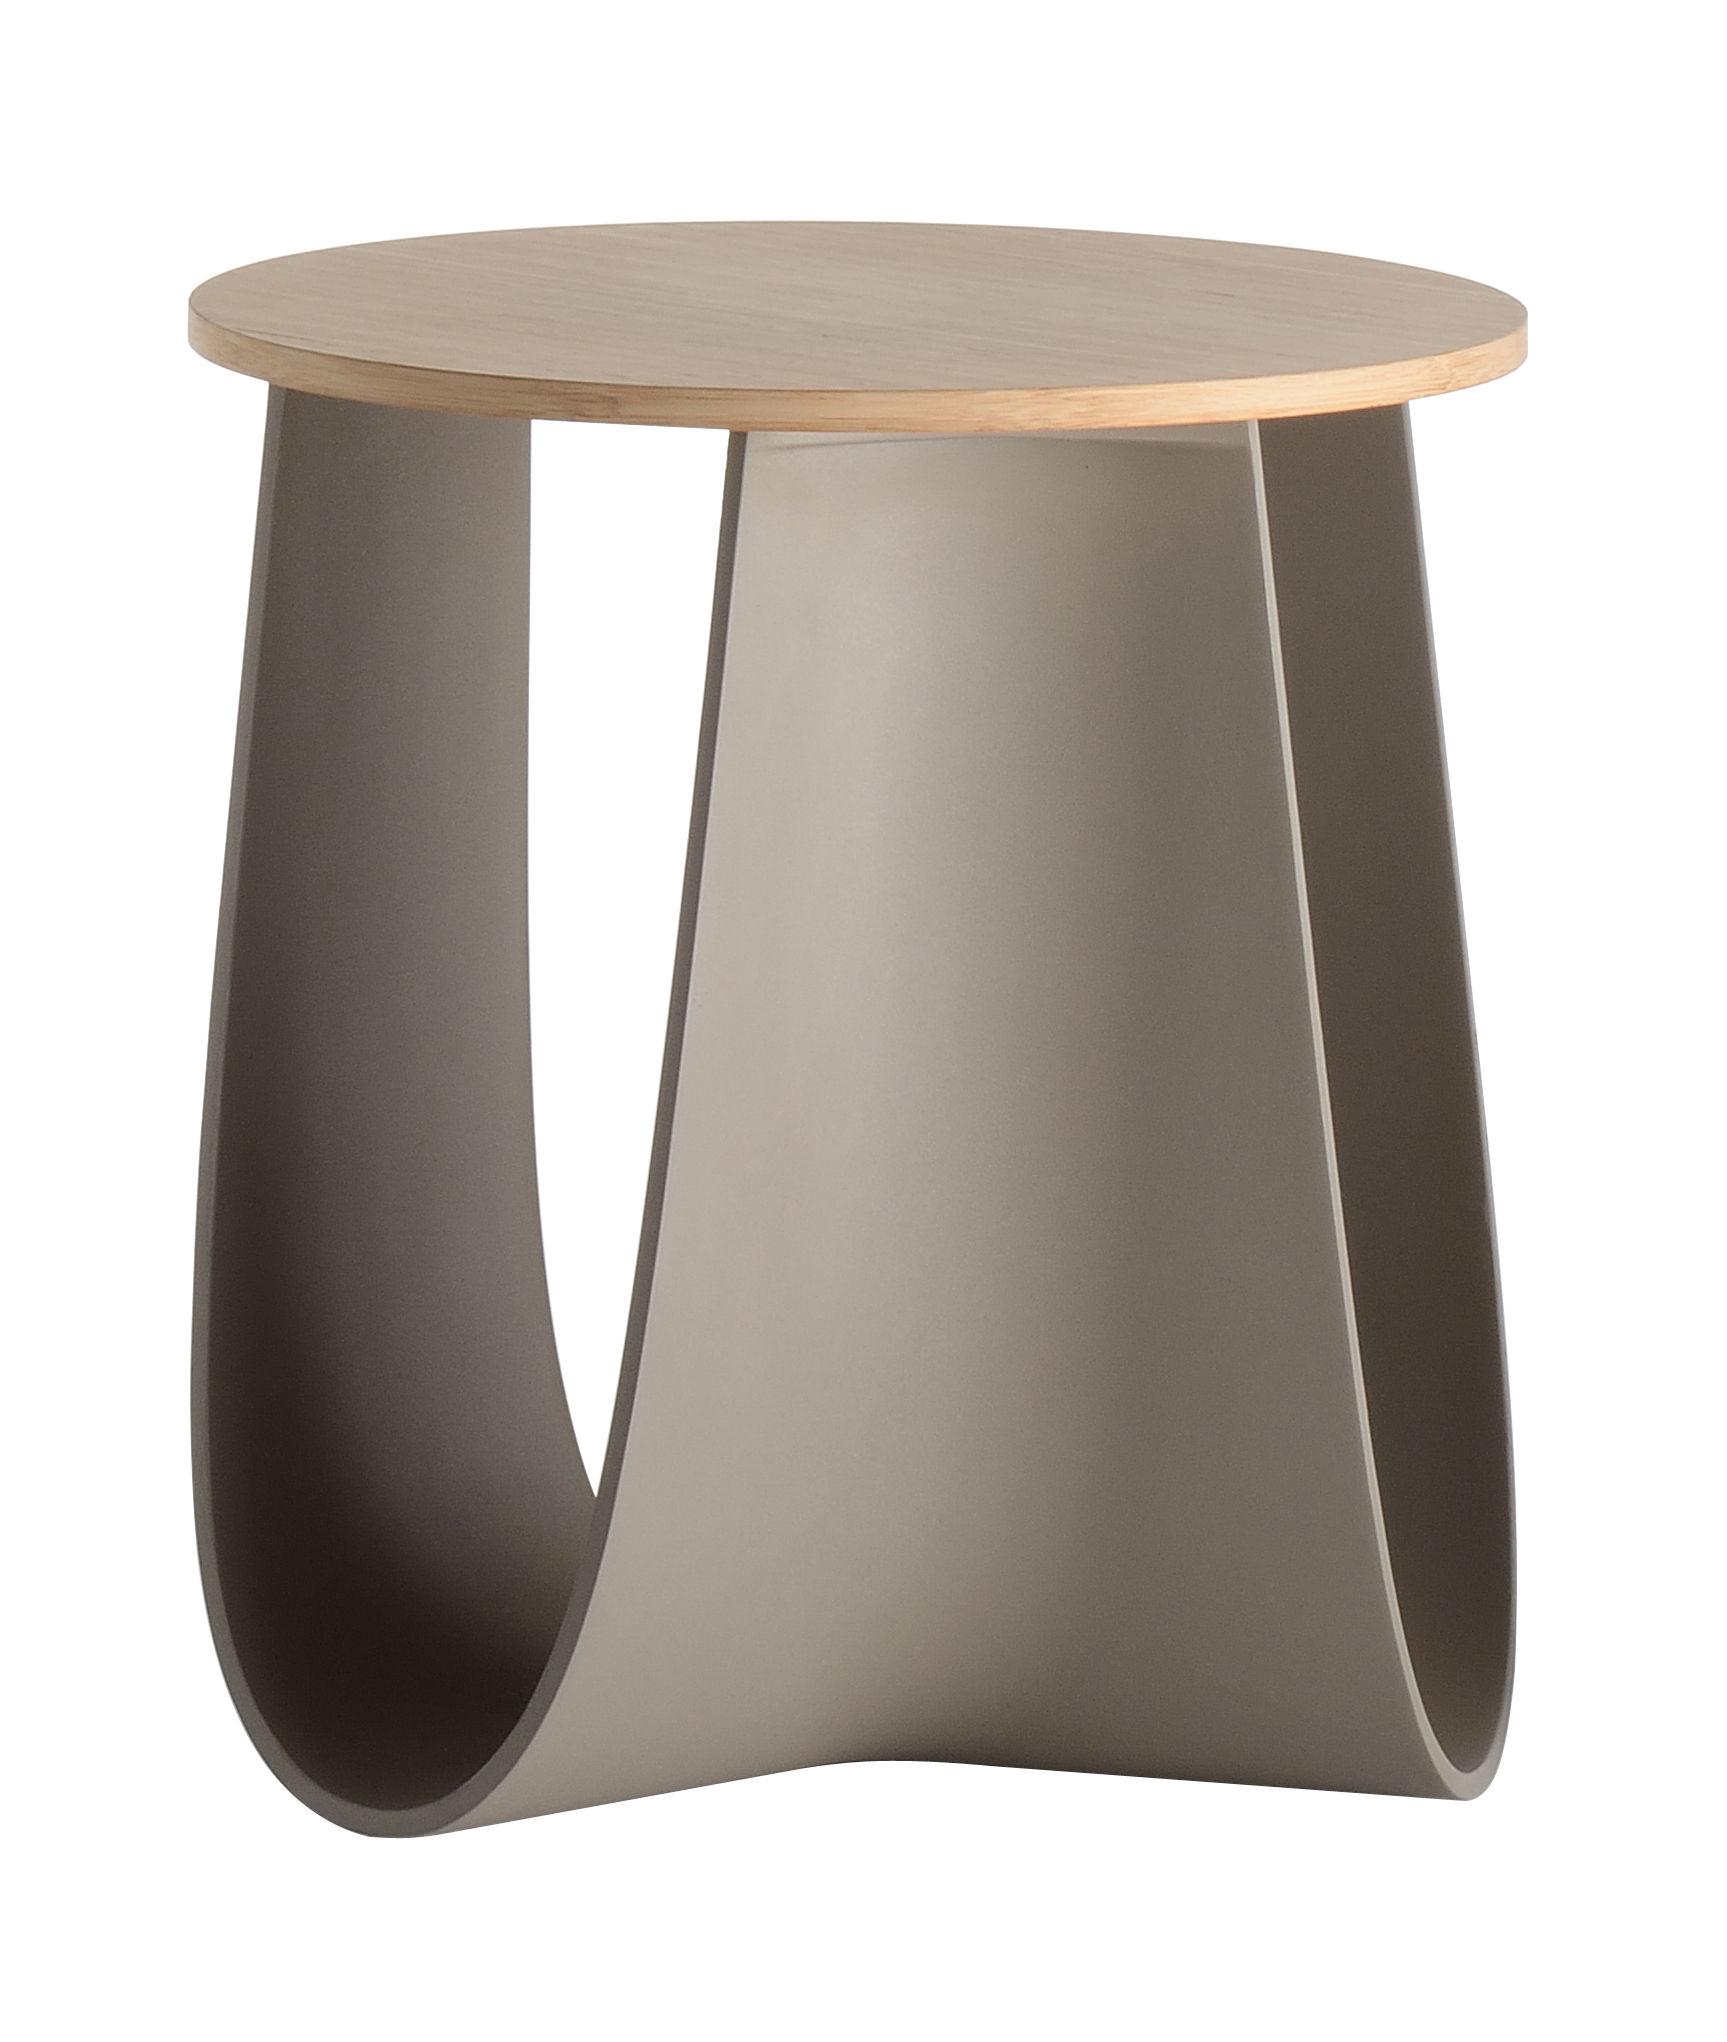 Mobilier - Tables basses - Tabouret Sag / Table H 43 cm - Assise bambou - MDF Italia - Taupe / Bambou - Contreplaqué de bambou, Polyuréthane